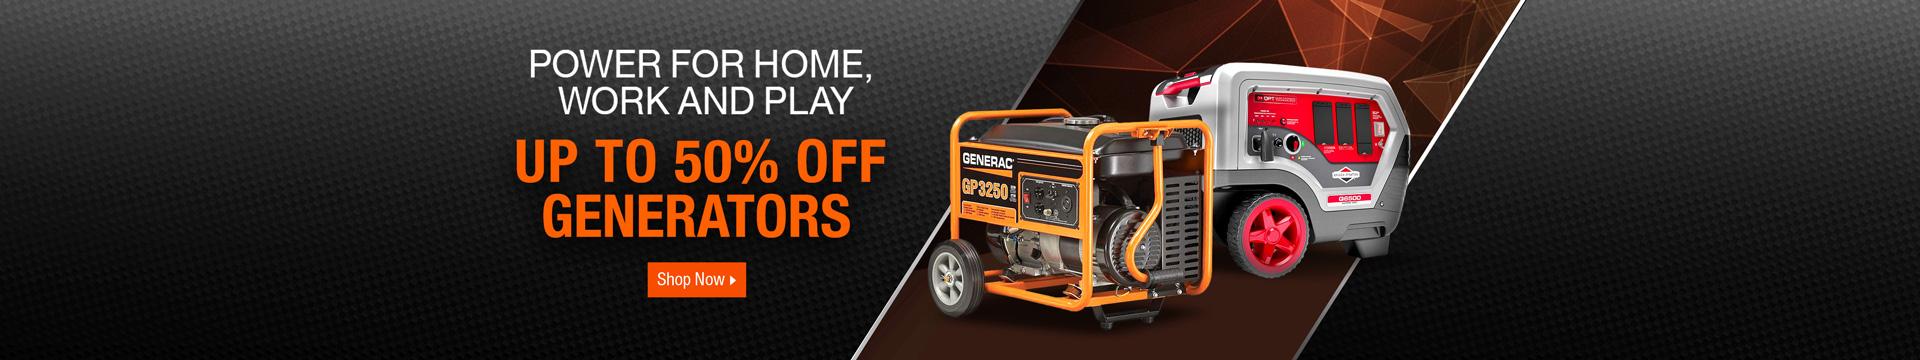 Up to 50% off Generators